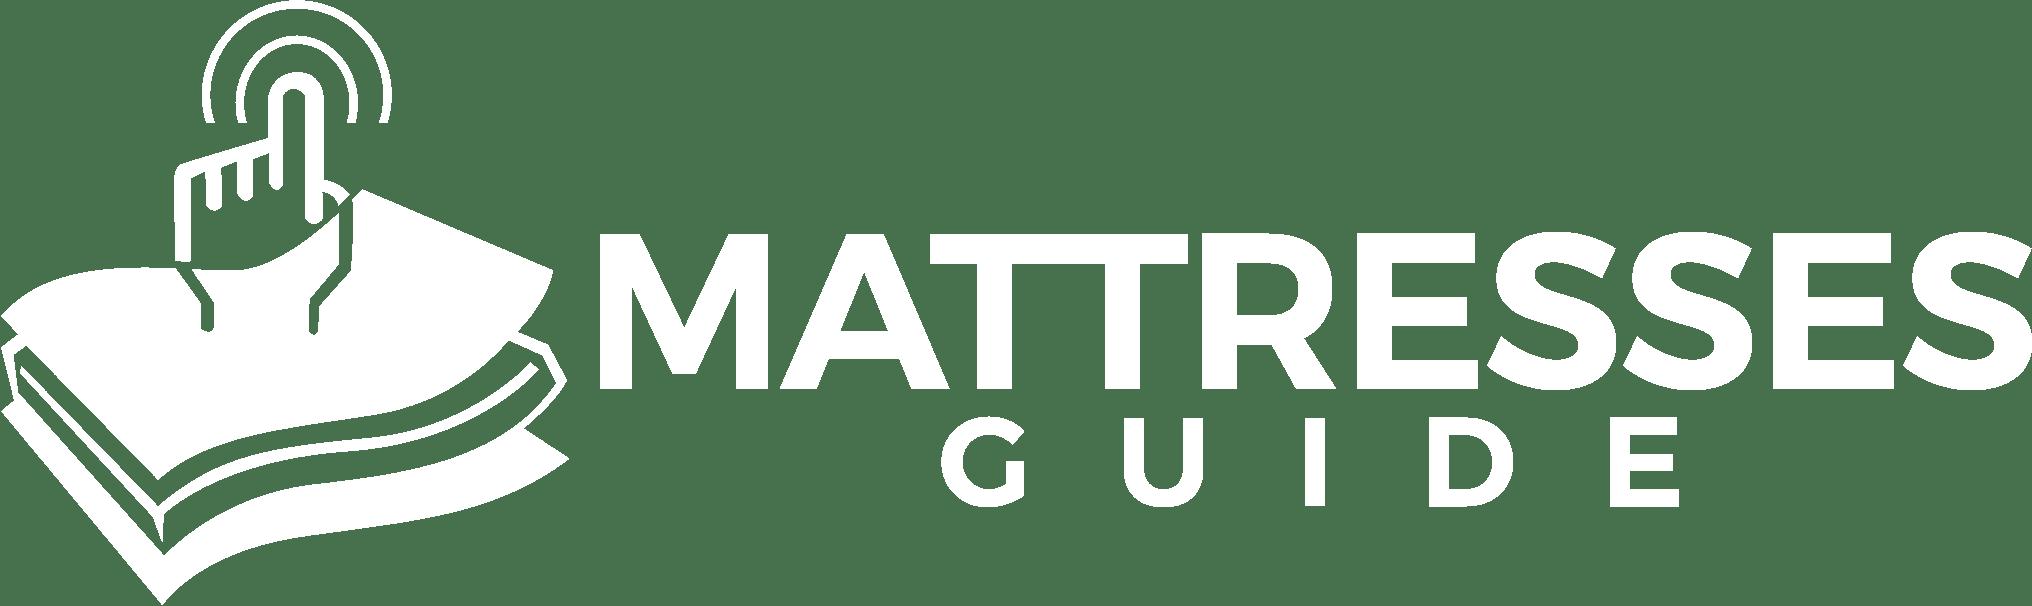 Mattresses Guide